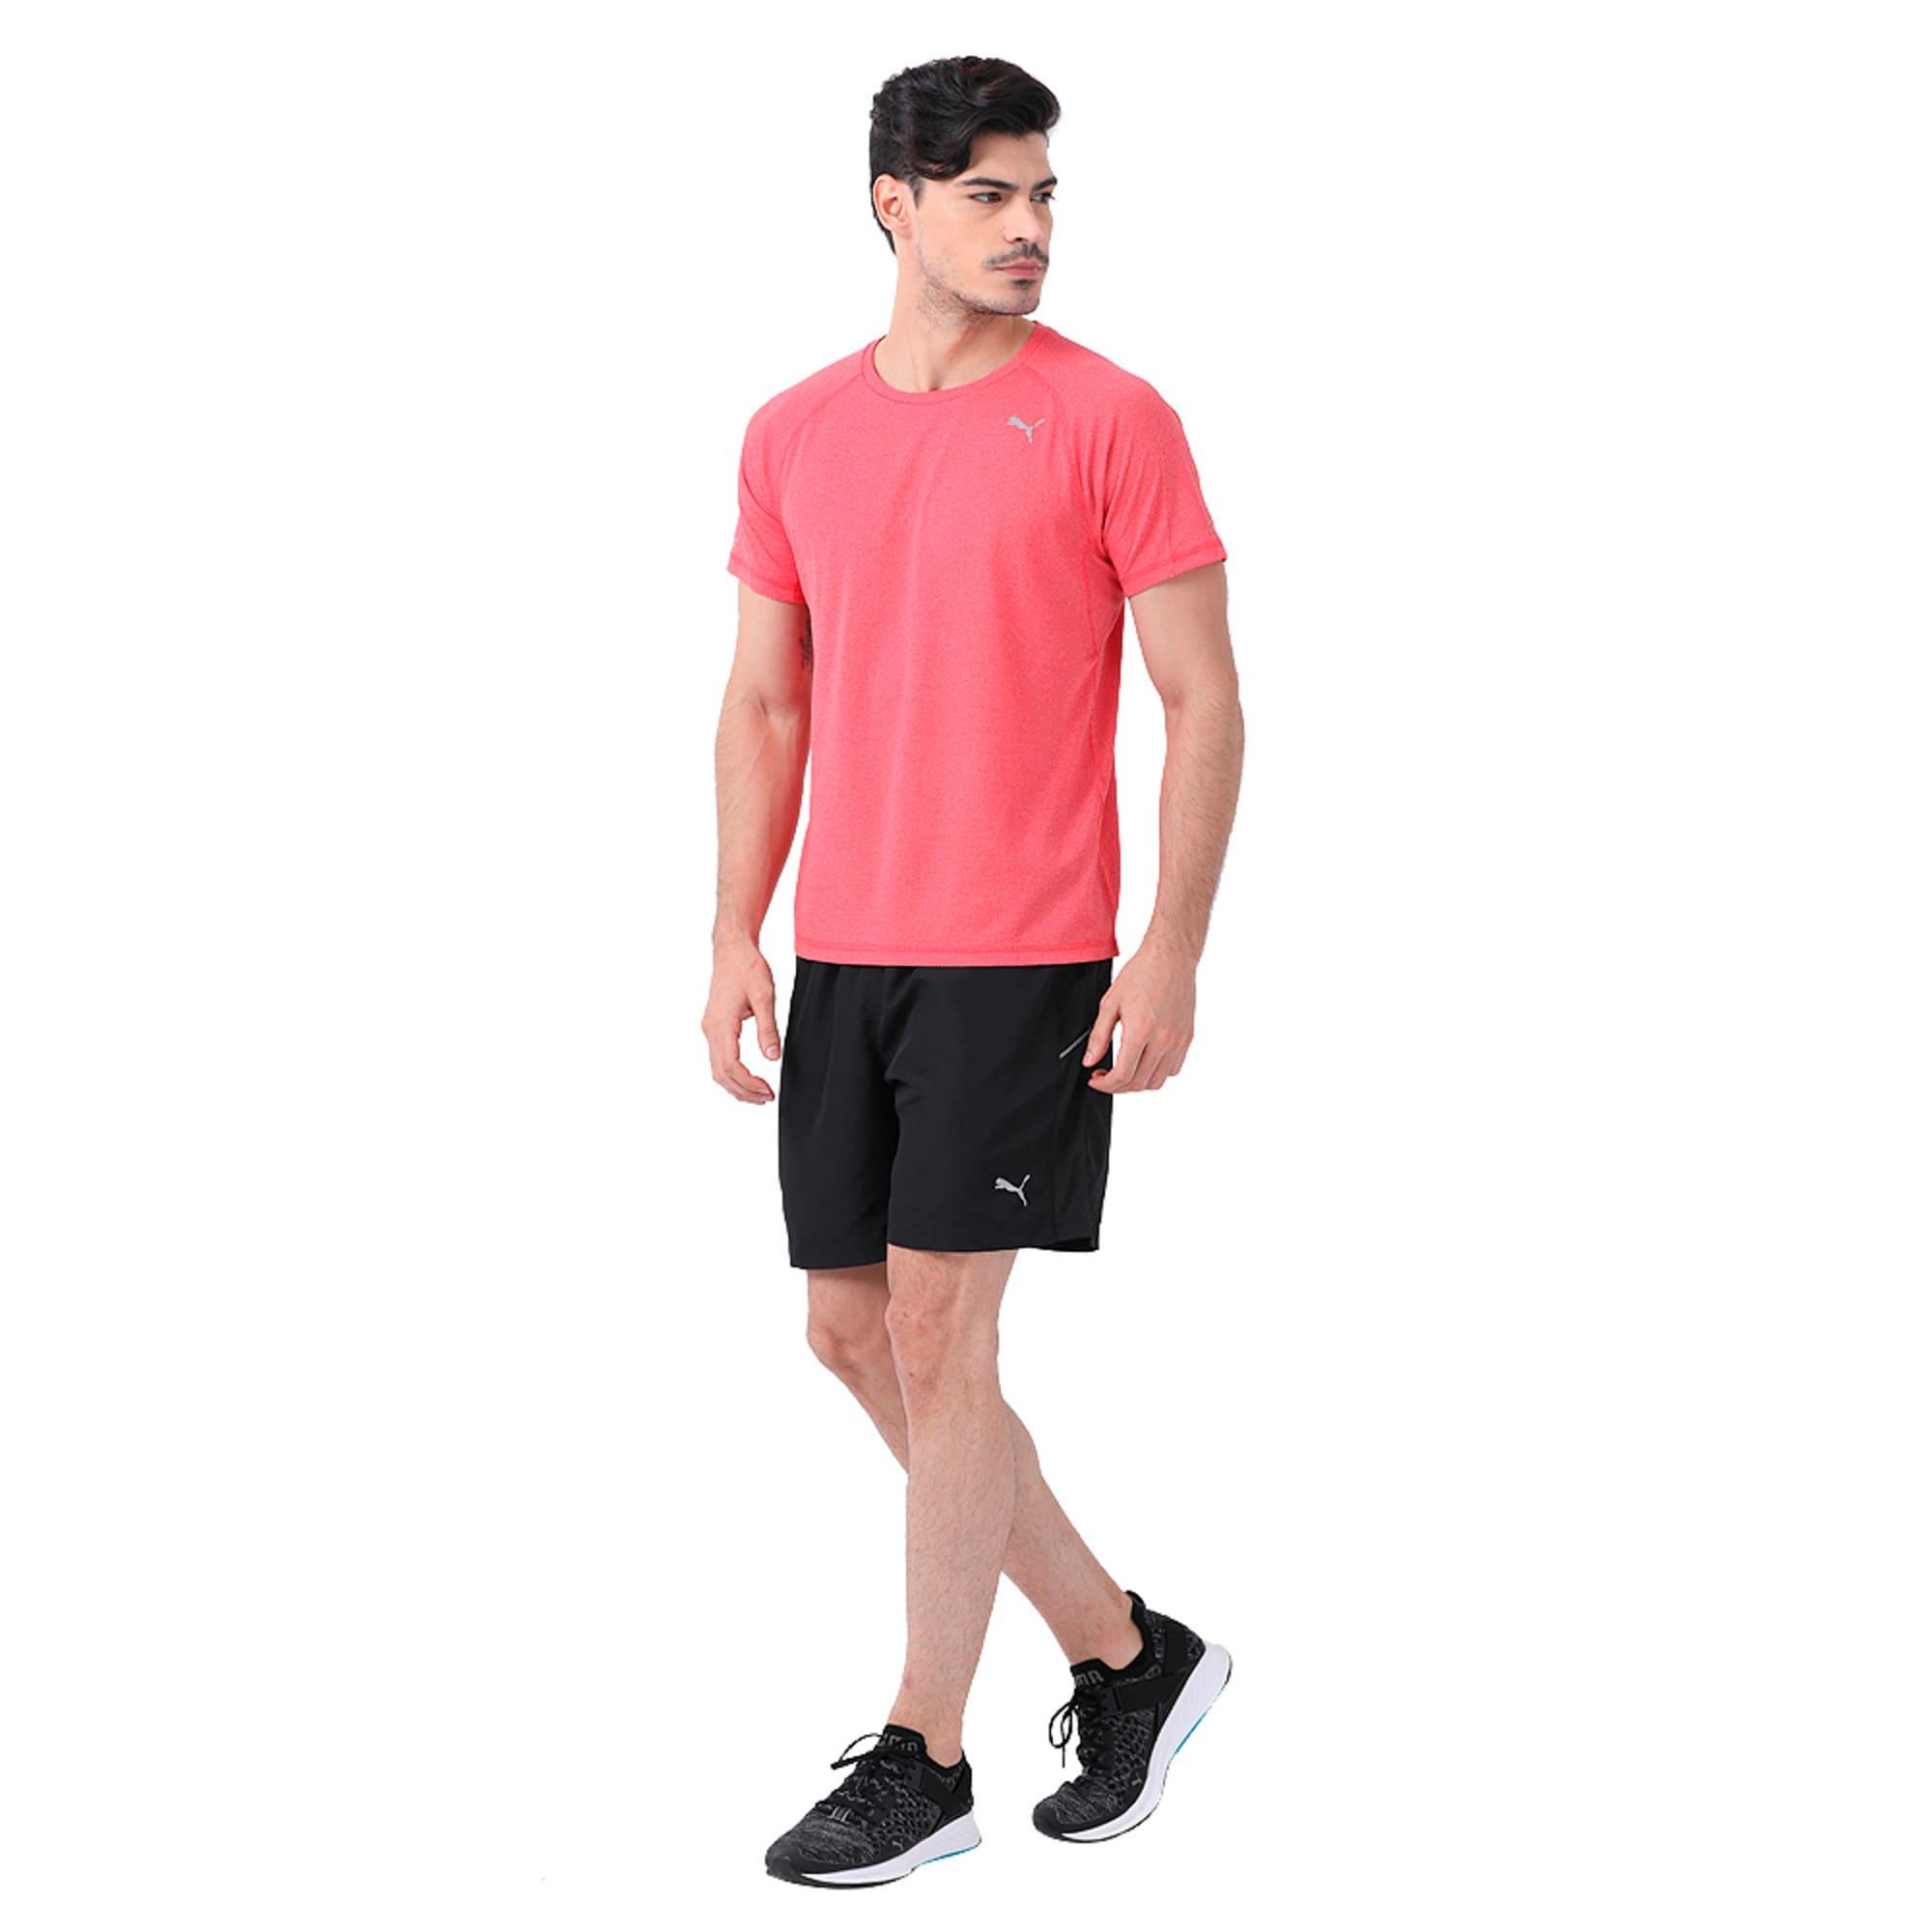 "Thumbnail 1 of Core-Run 7"" Shorts, Puma Black, medium-IND"